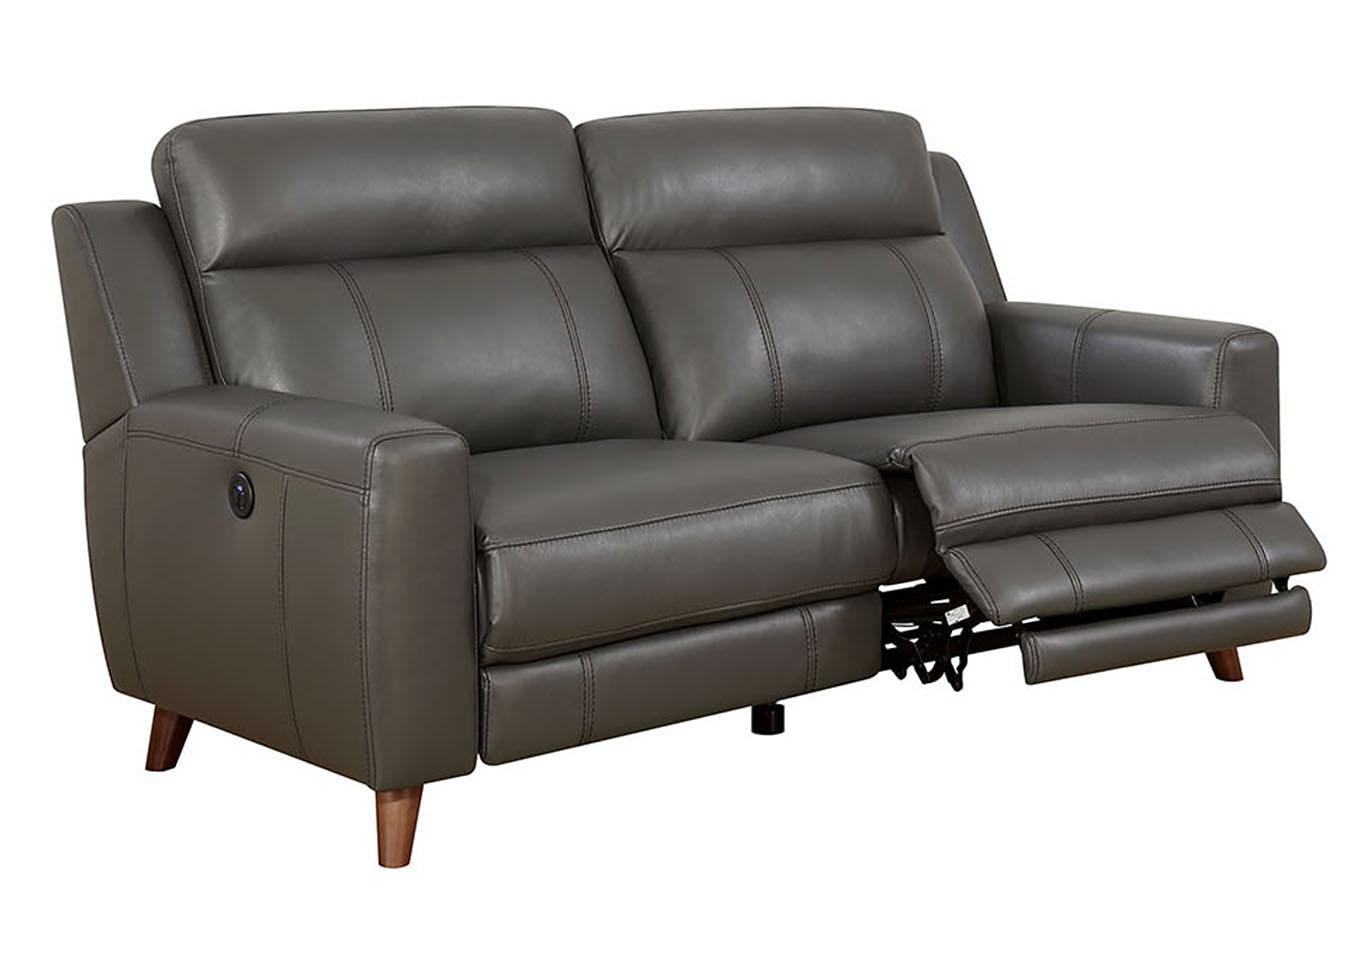 Squan Furniture Rosalyn Gray Leather Gel Power Reclining Sofa